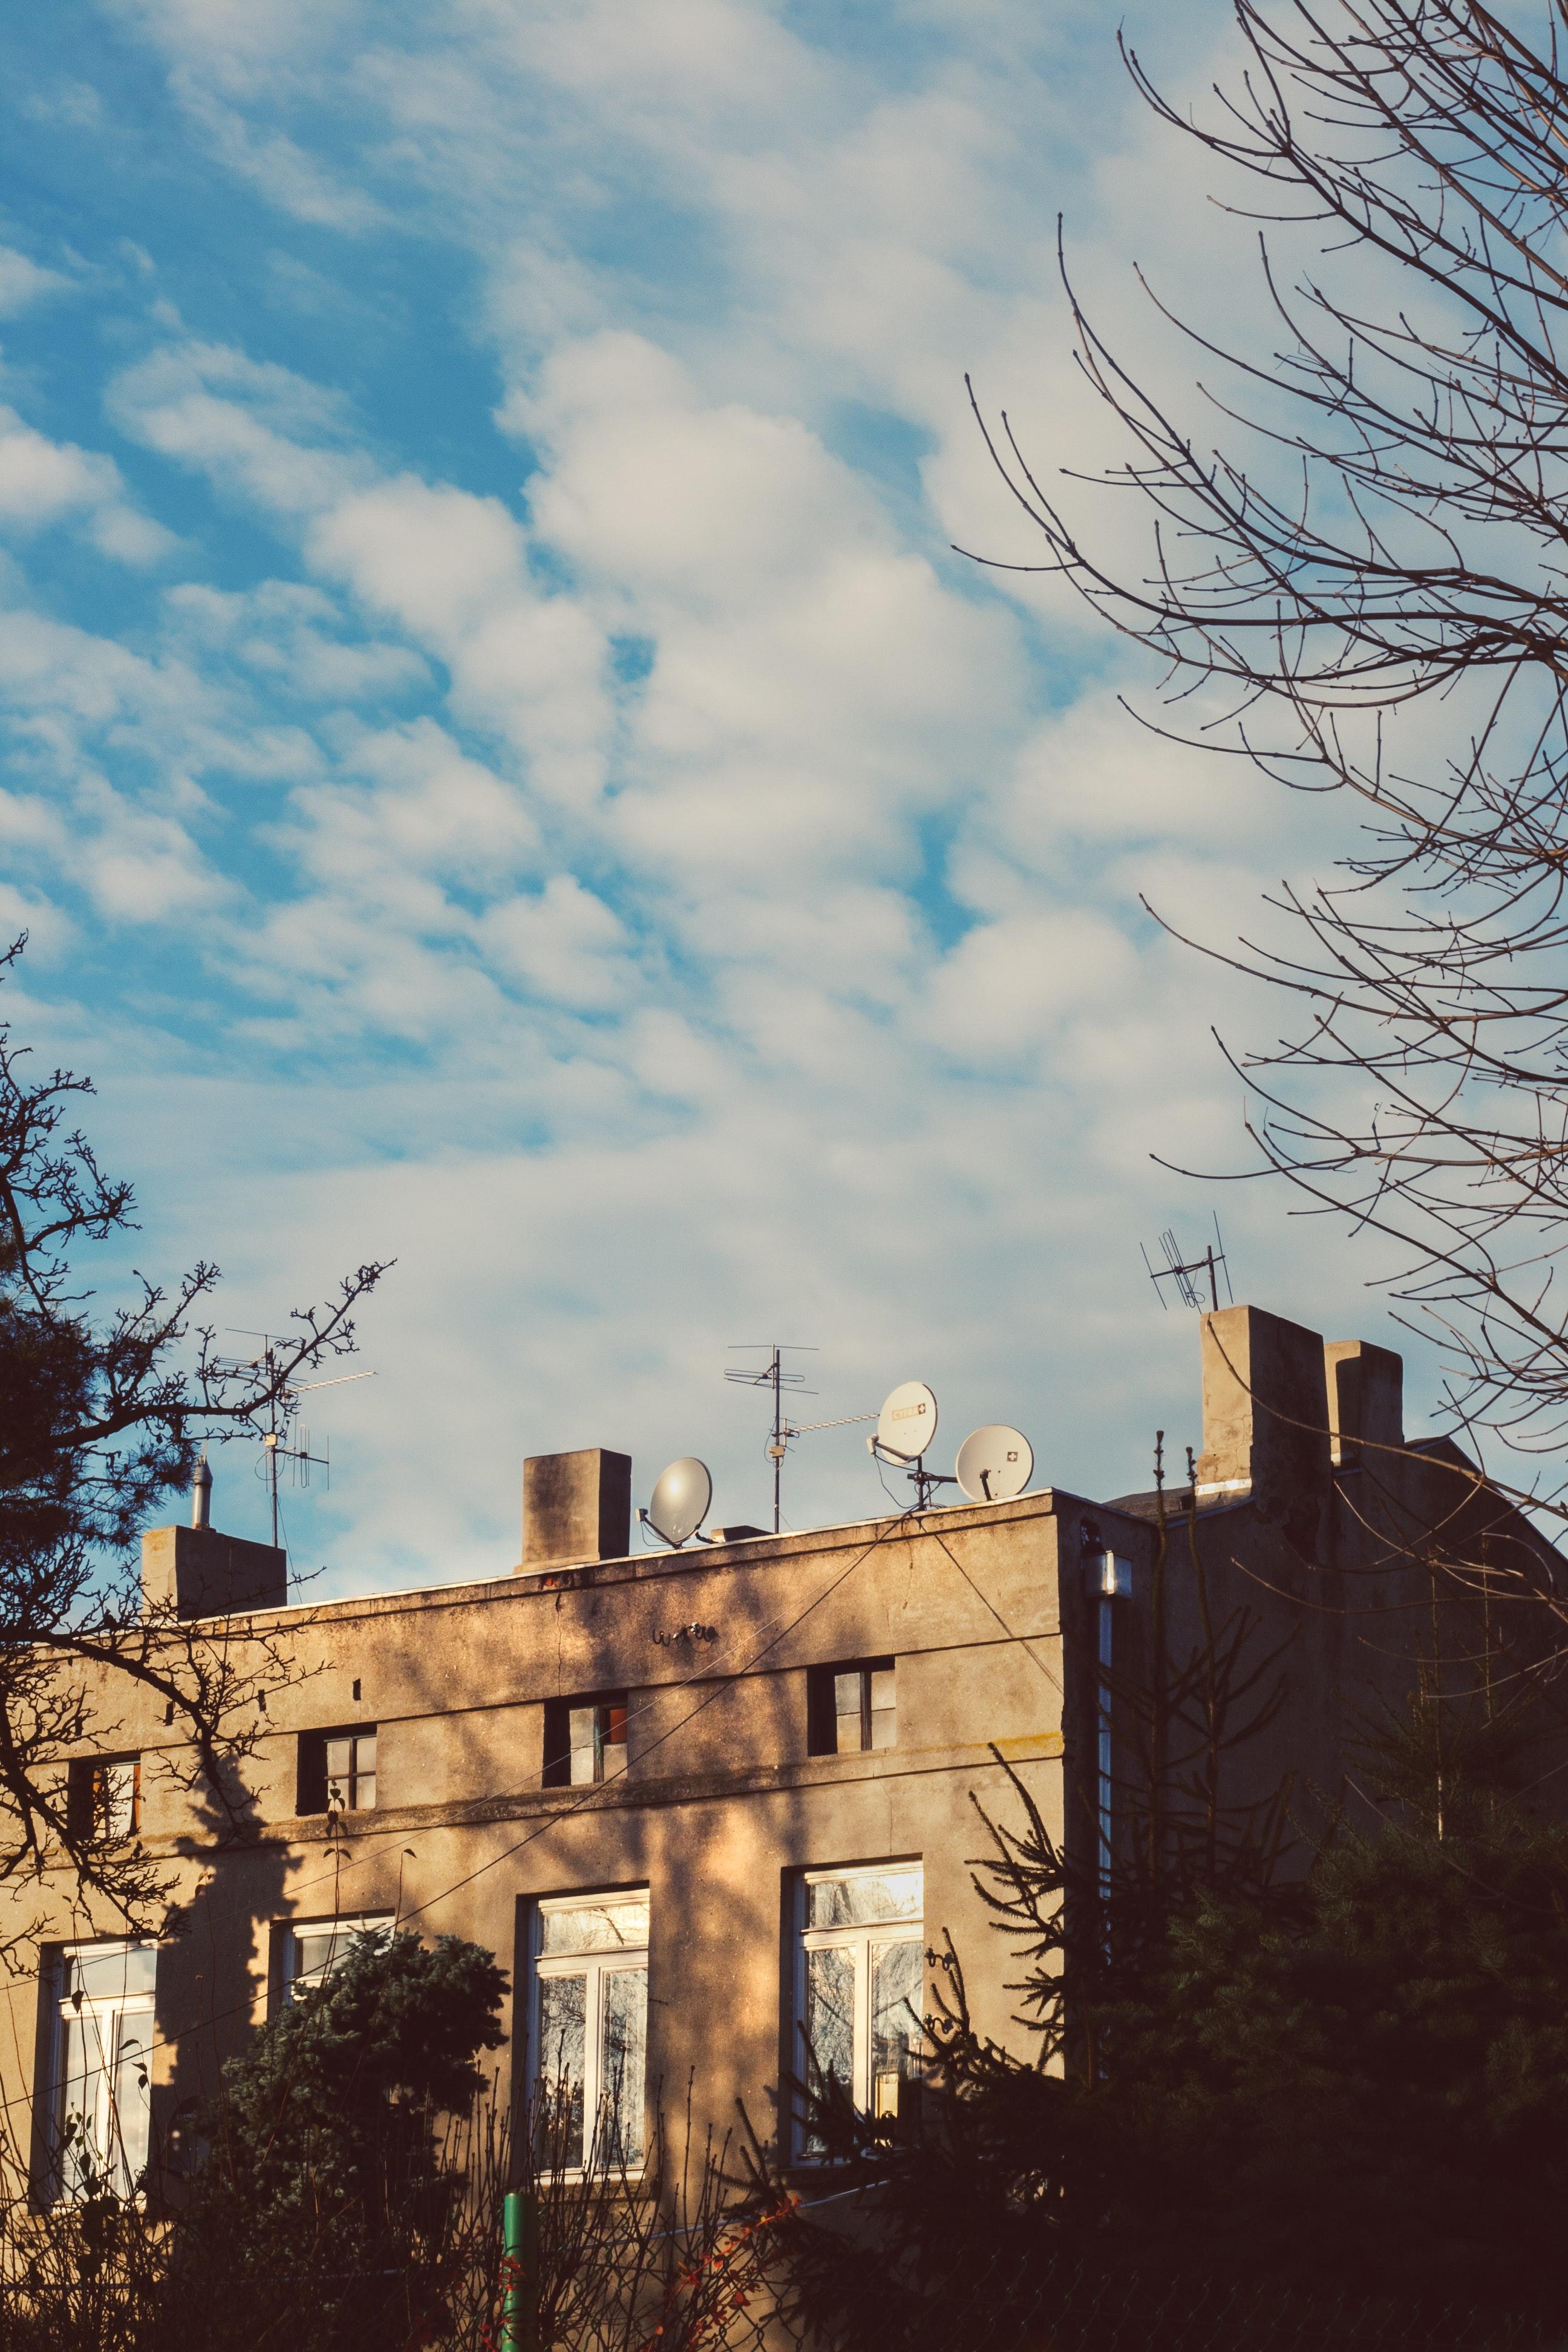 Tenement house & blue sky photo